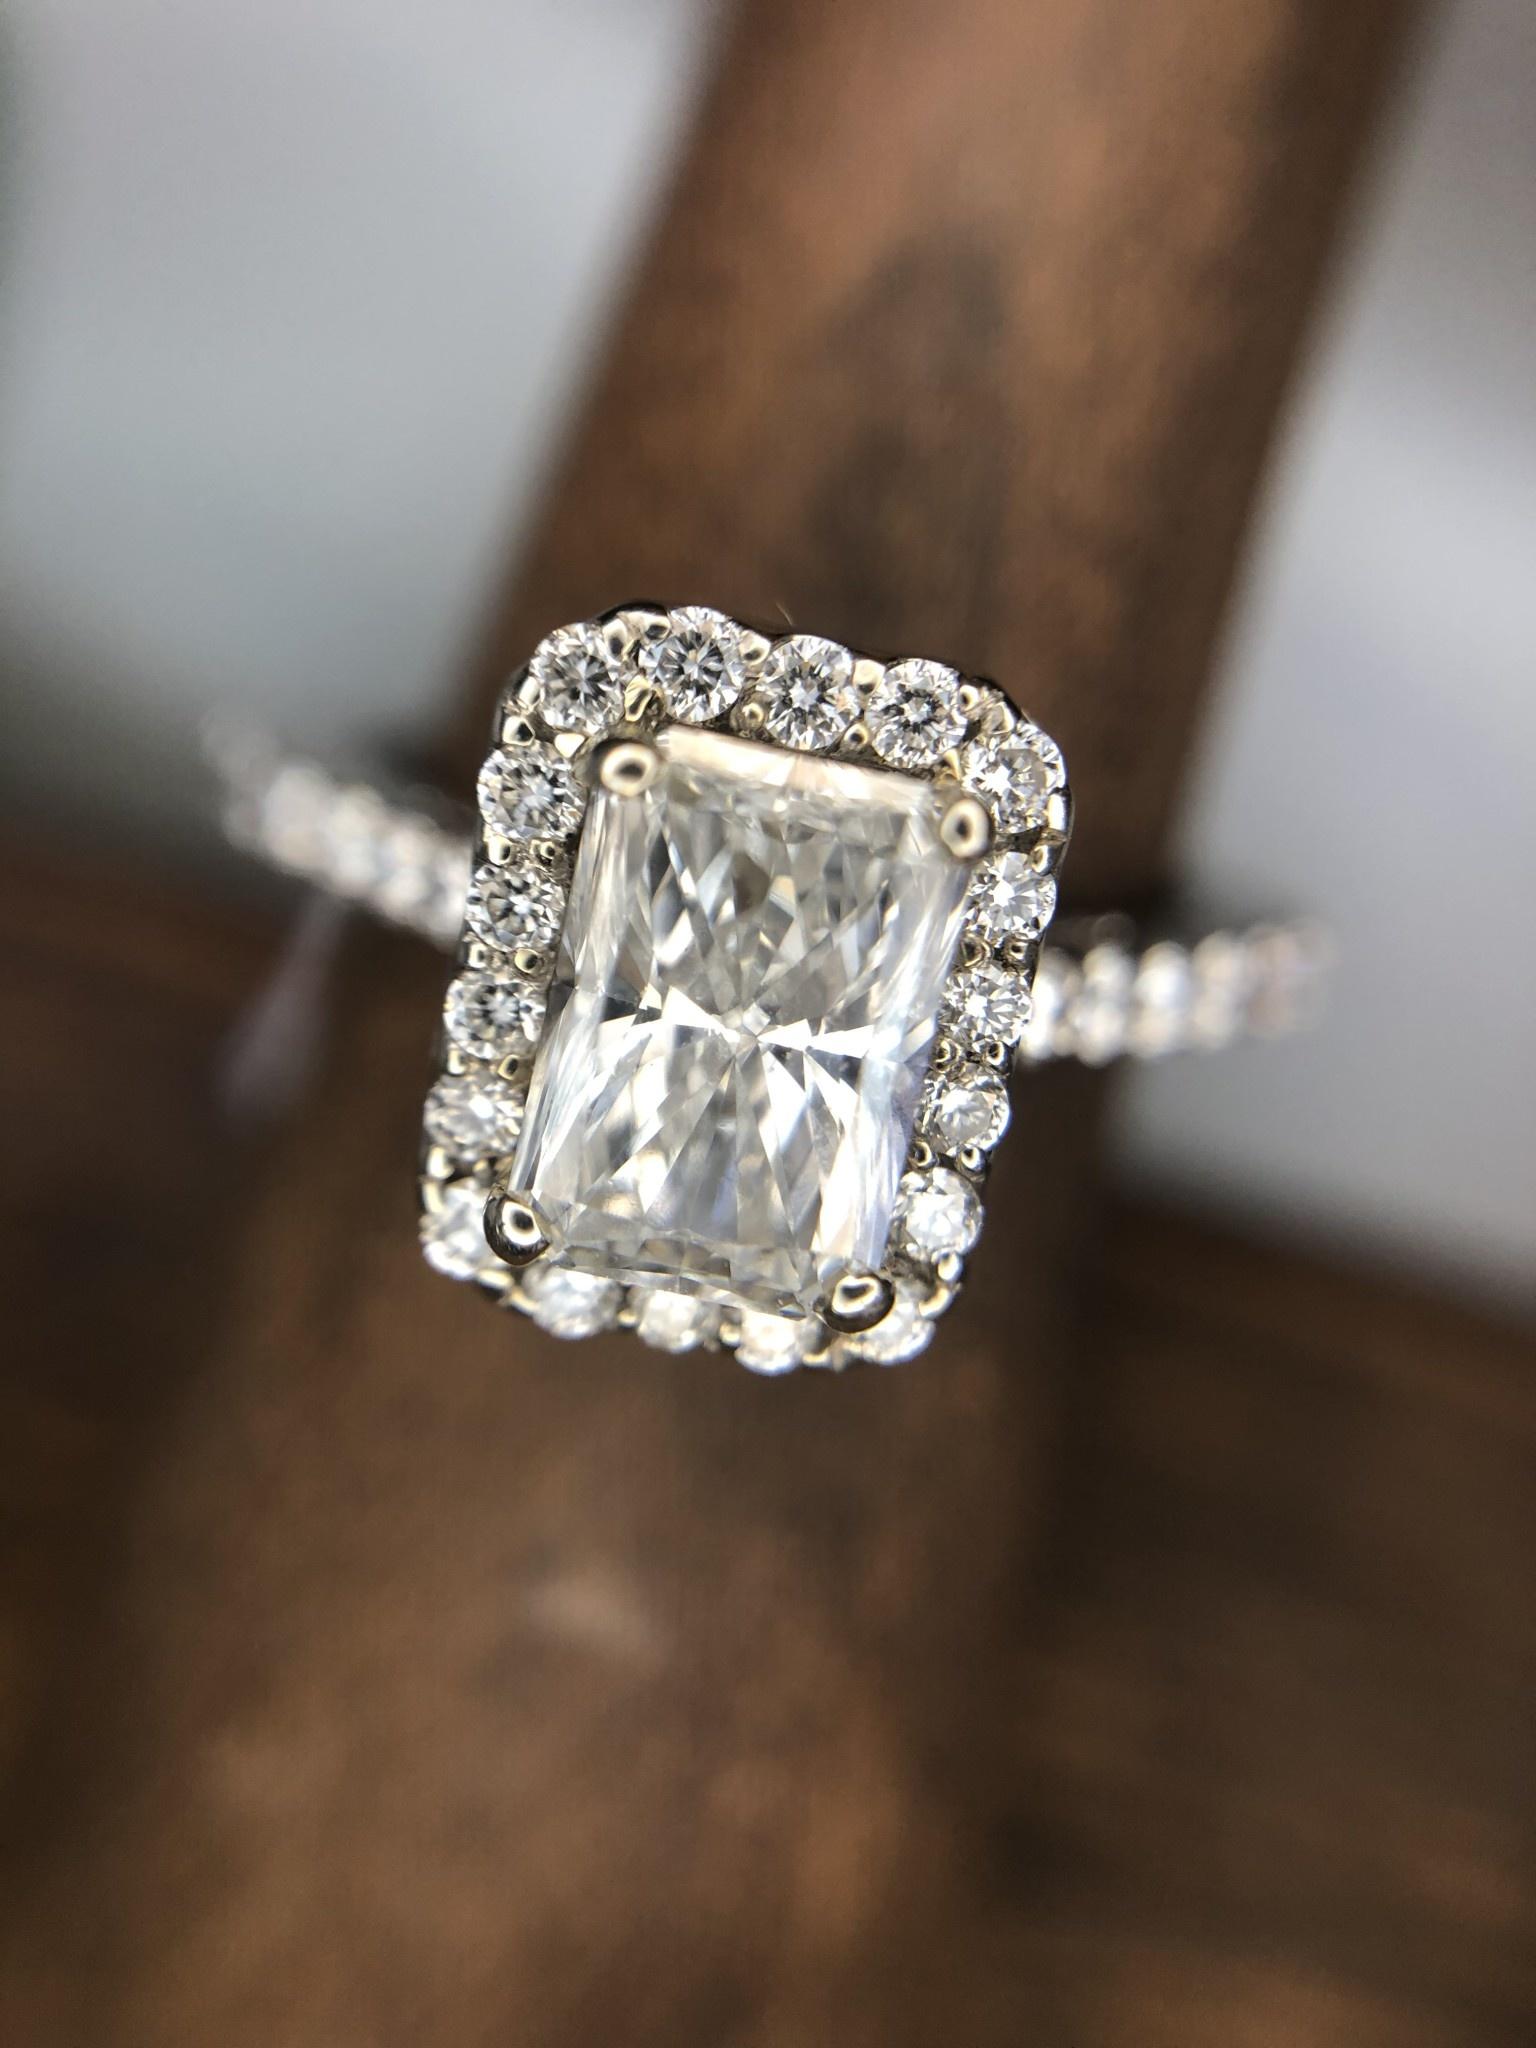 1.0ct Diamond RC 14k White Gold Halo Ring